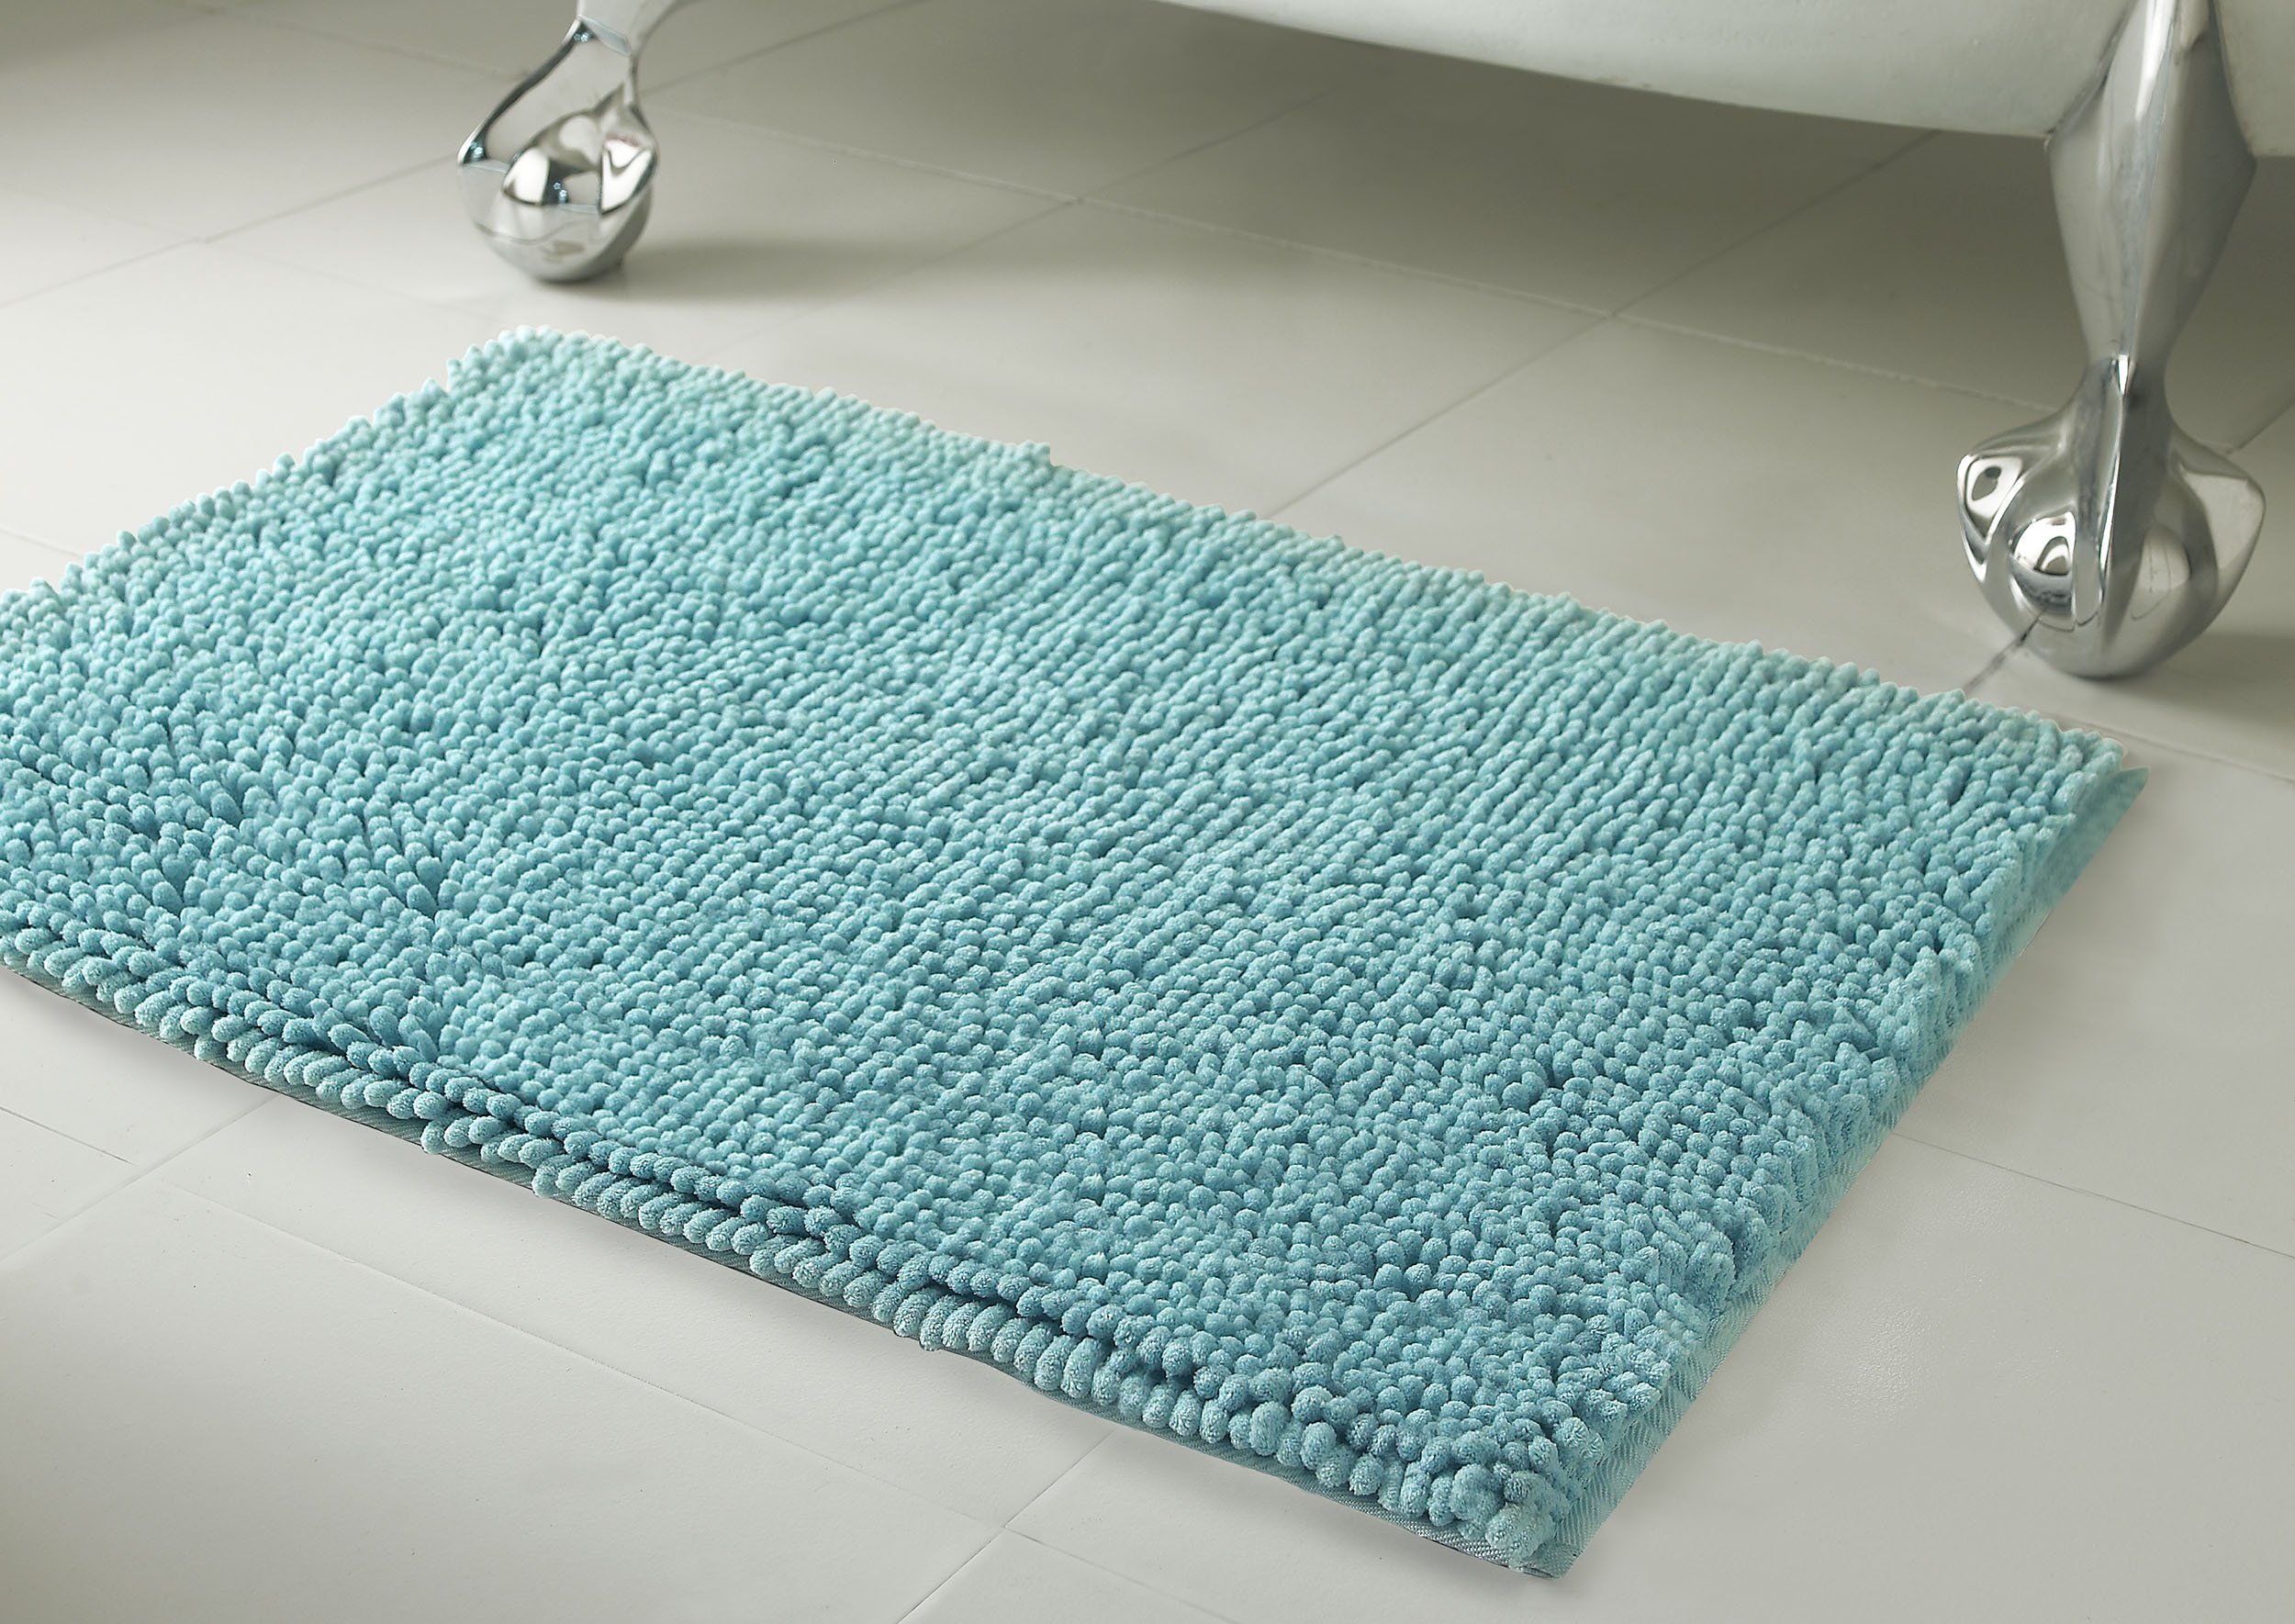 Resort Collection Plush Shag Chenille 17 x 24 Bath Mat, Aqua